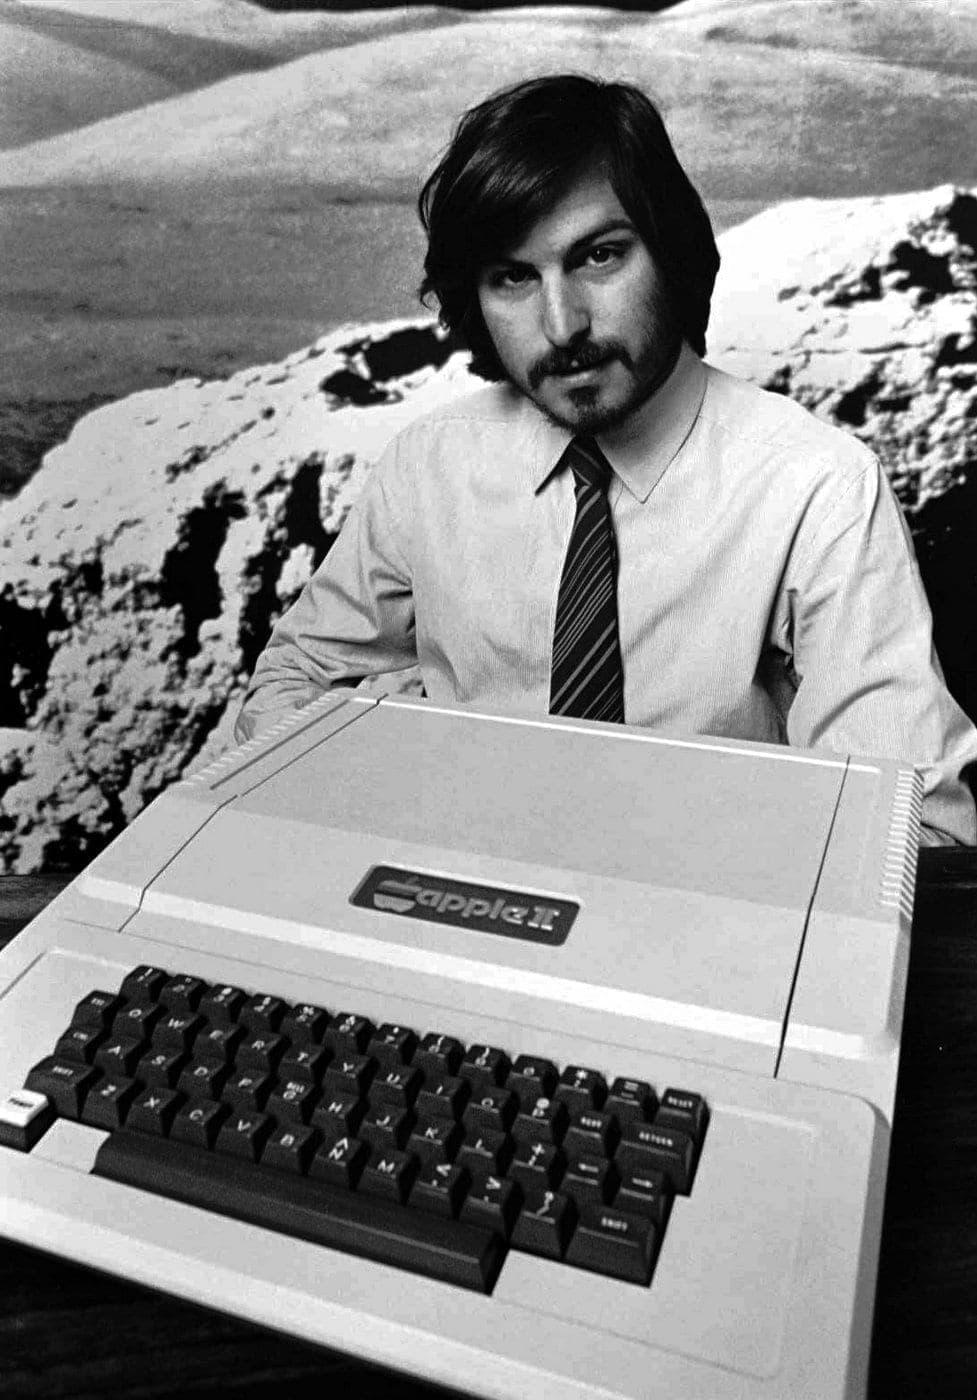 Steve Jobs introducing the Apple II computer in 1977 in Cupertino, California